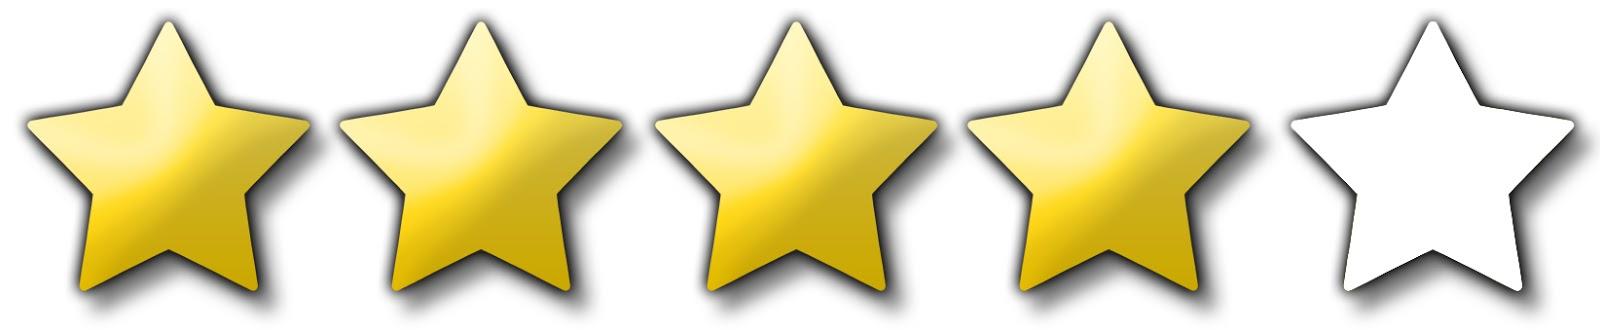 books 5 asterisk reviews